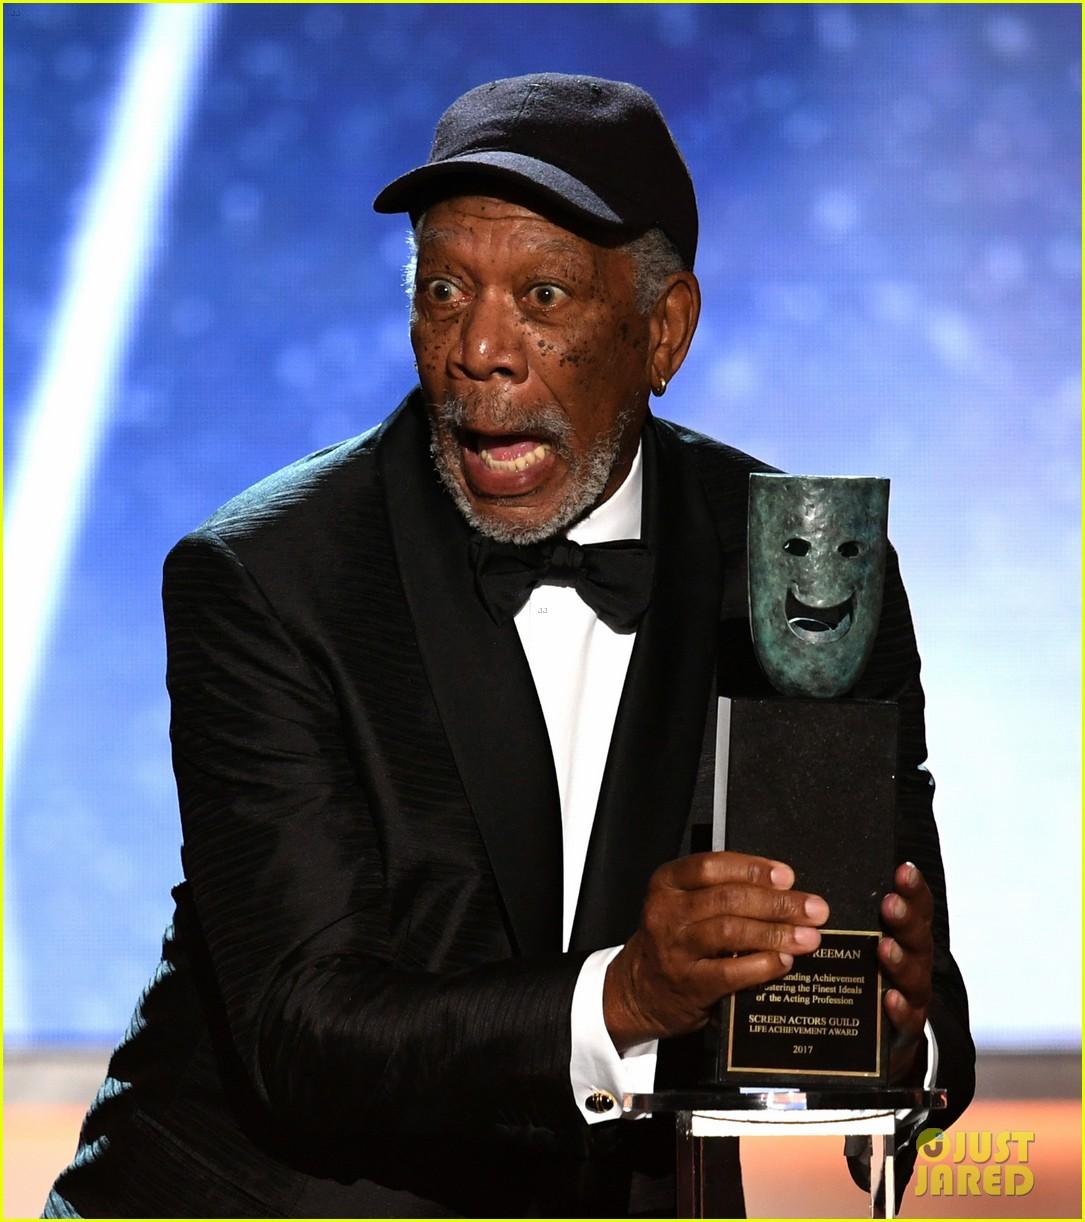 Morgan Freeman Accepts The Lifetime Acheivement Award At